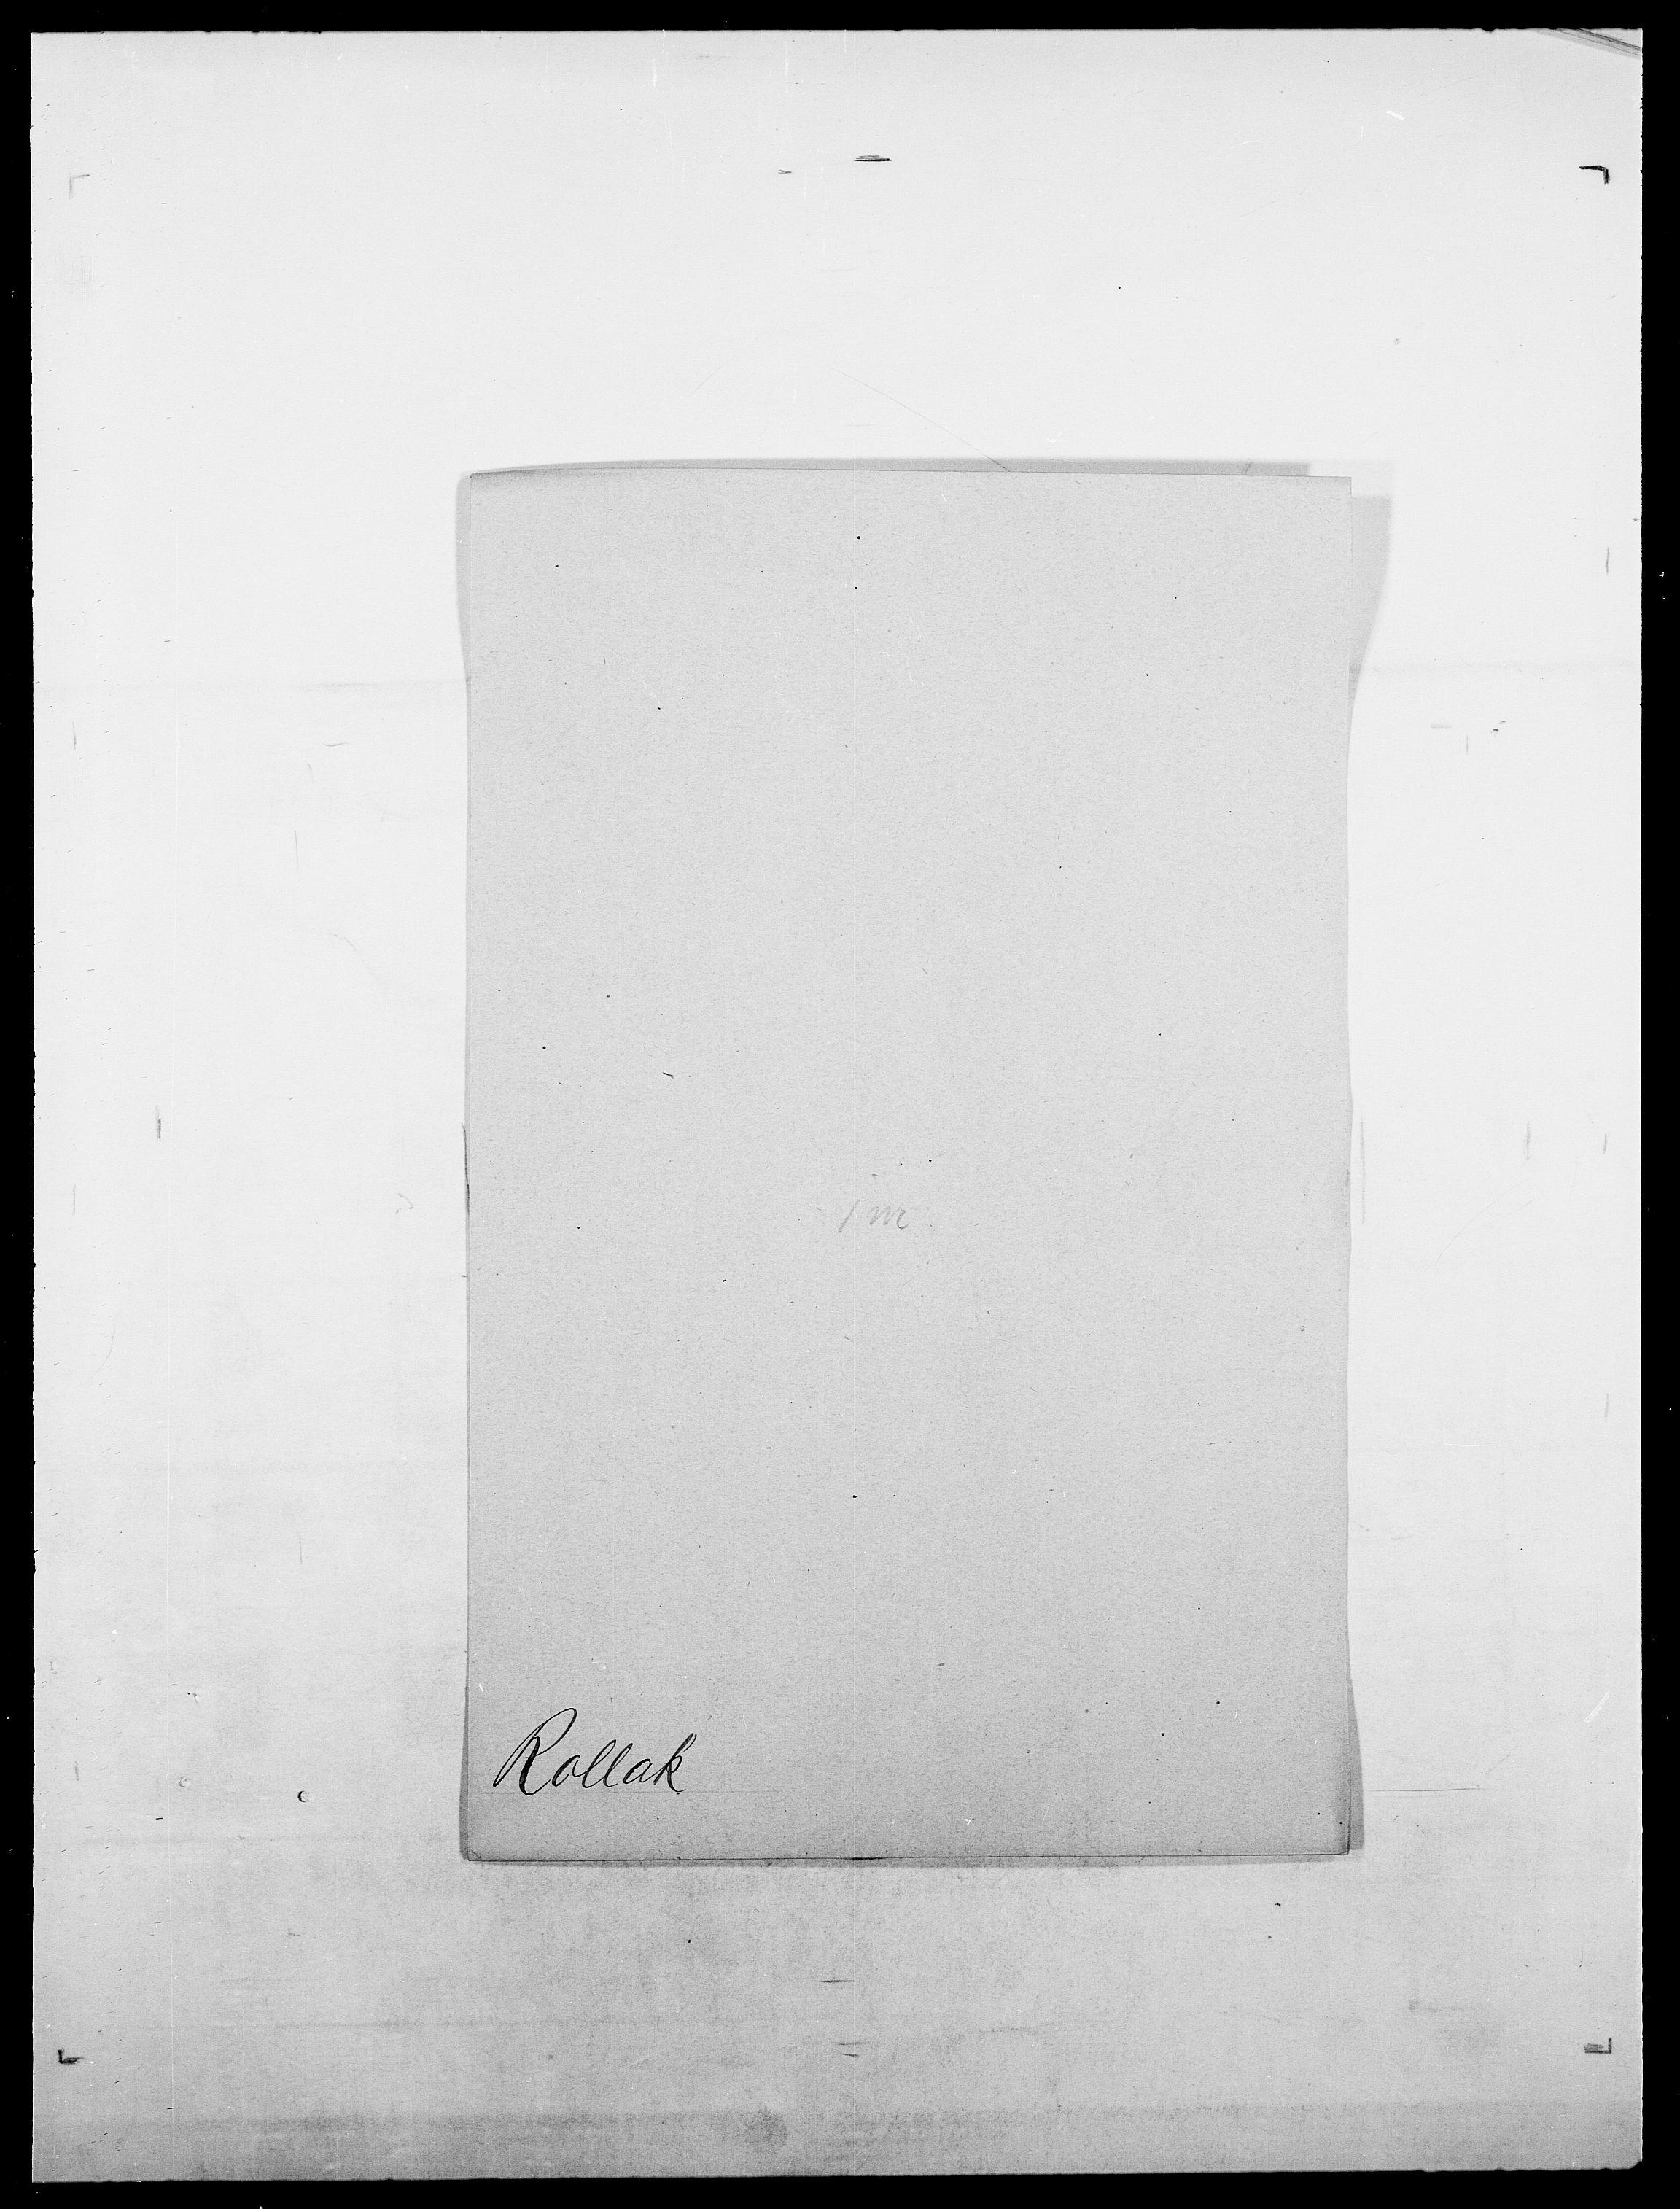 SAO, Delgobe, Charles Antoine - samling, D/Da/L0033: Roald - Røyem, s. 150